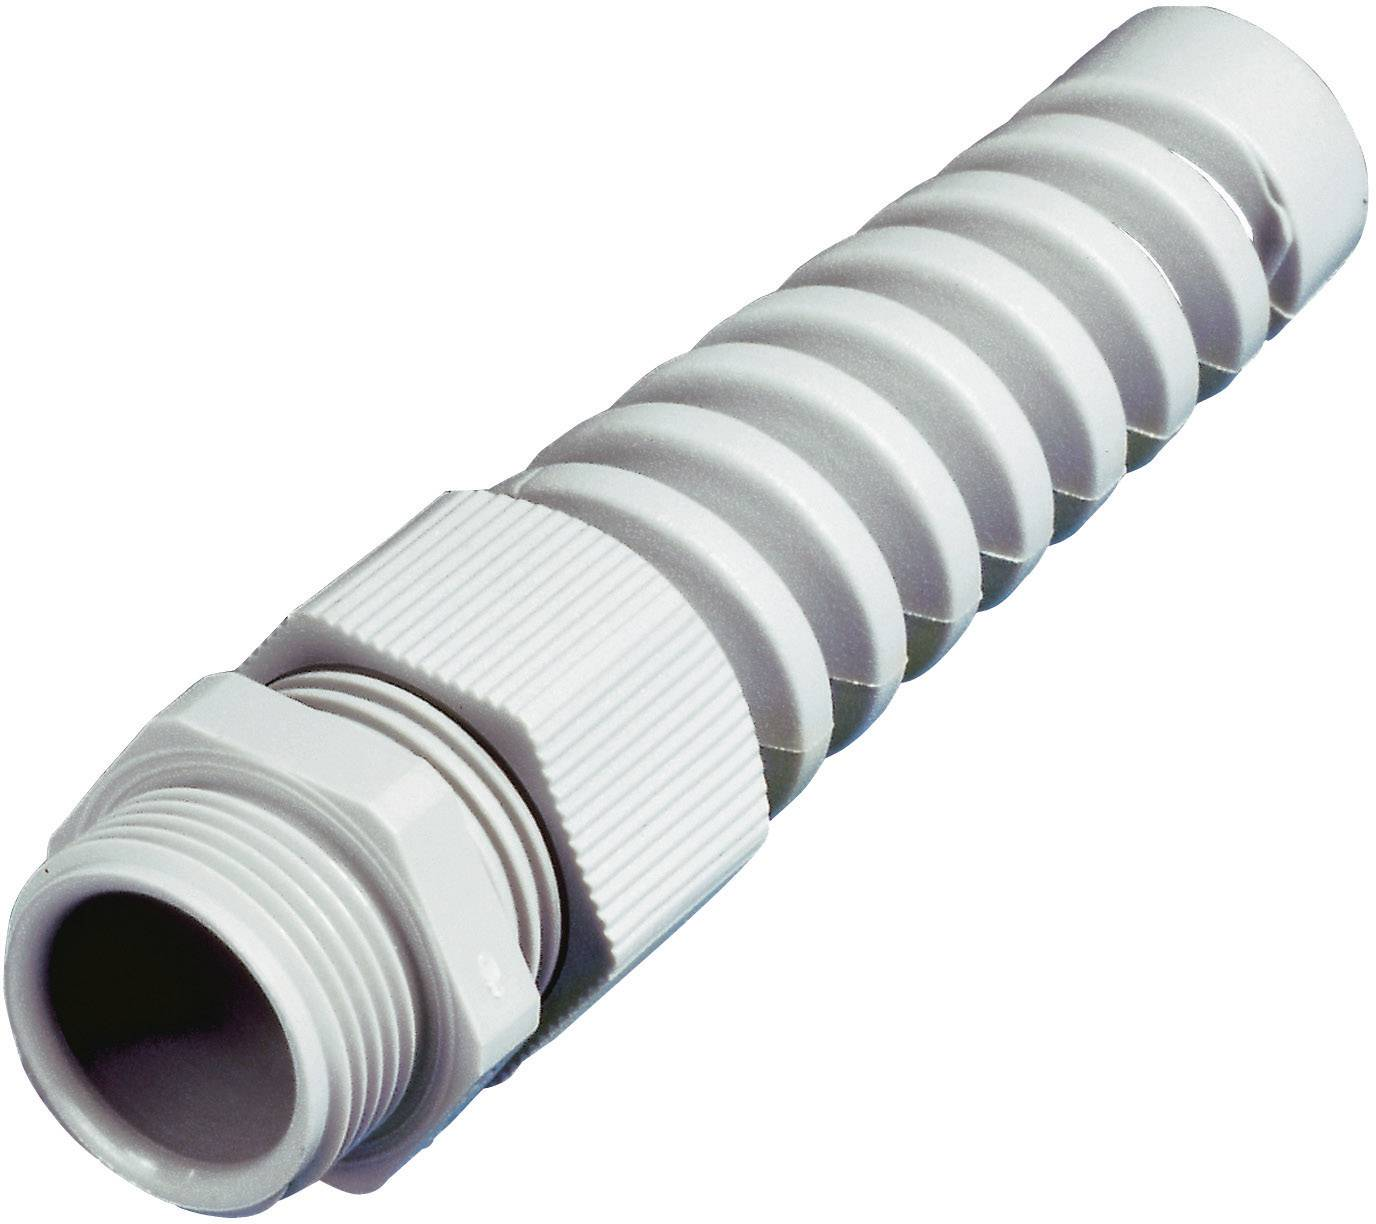 Káblová priechodka Wiska ESKVS M32 RAL 9005, polyamid, čierna, 1 ks